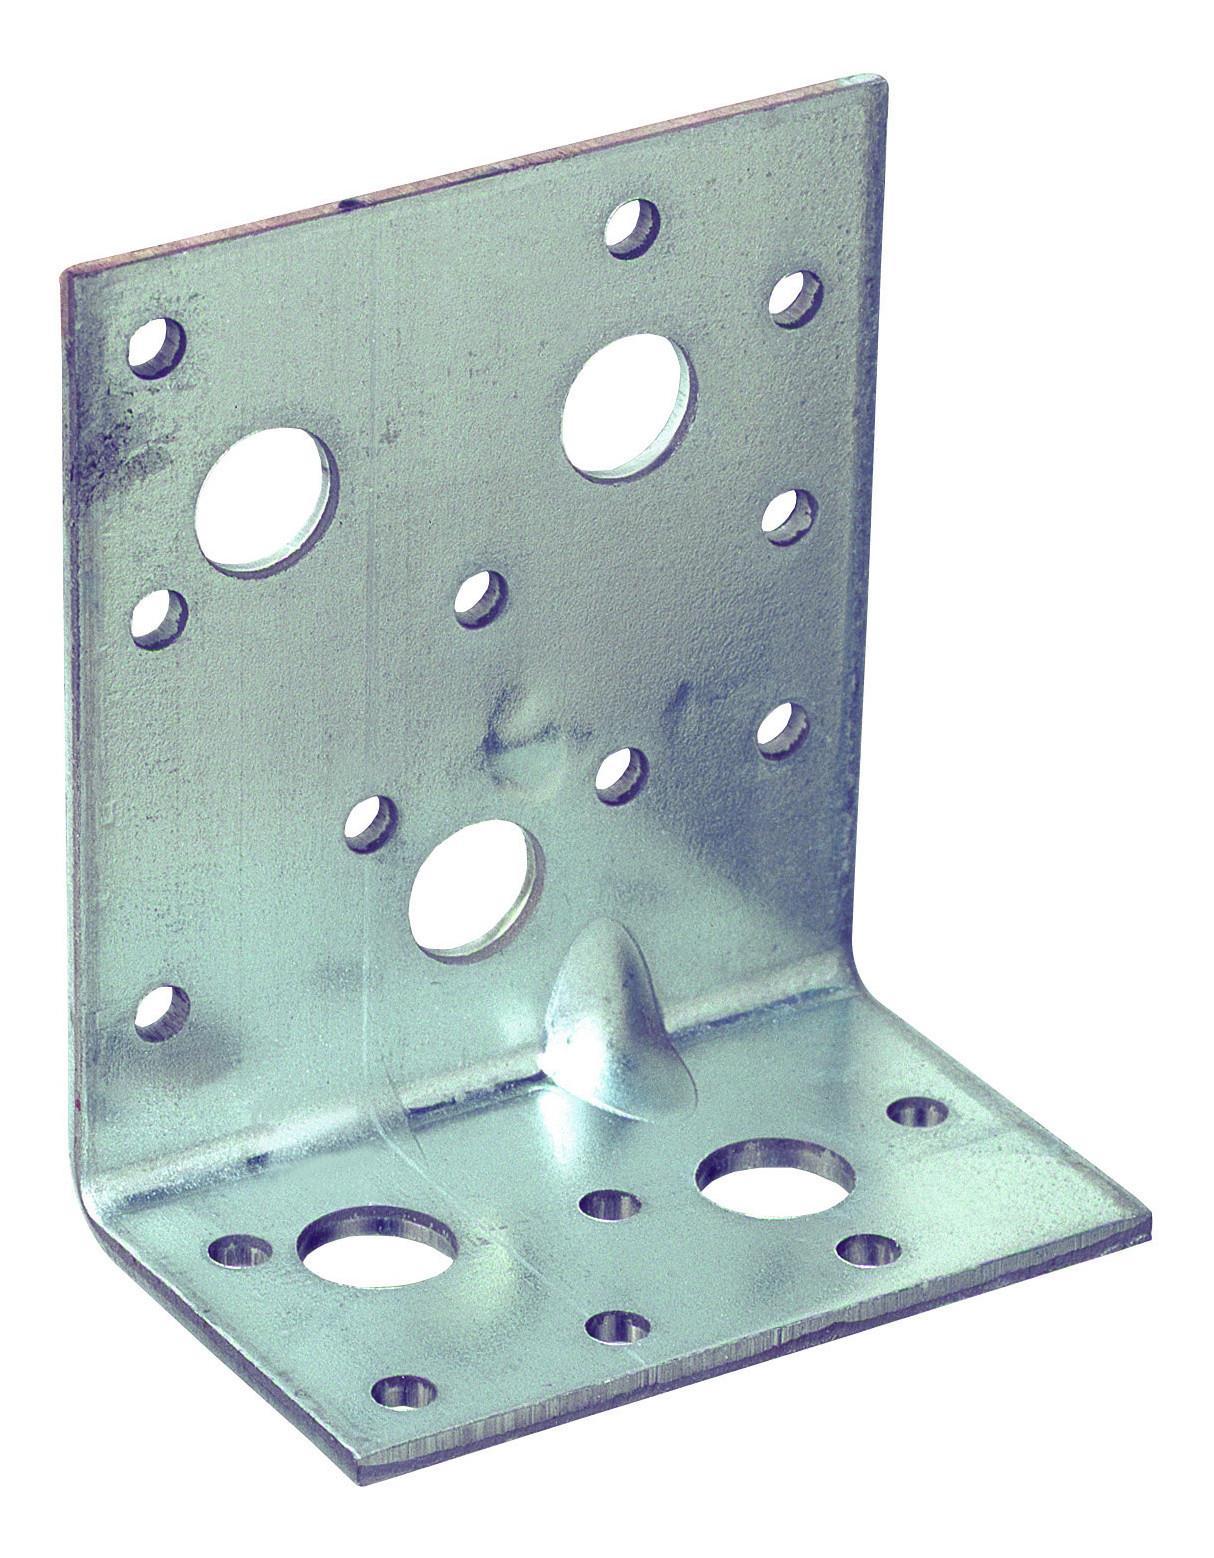 Joma 4040000 Vinkelbeslag 50-pack ETA-10/0382 30 x 90 x 48 x 76 mm